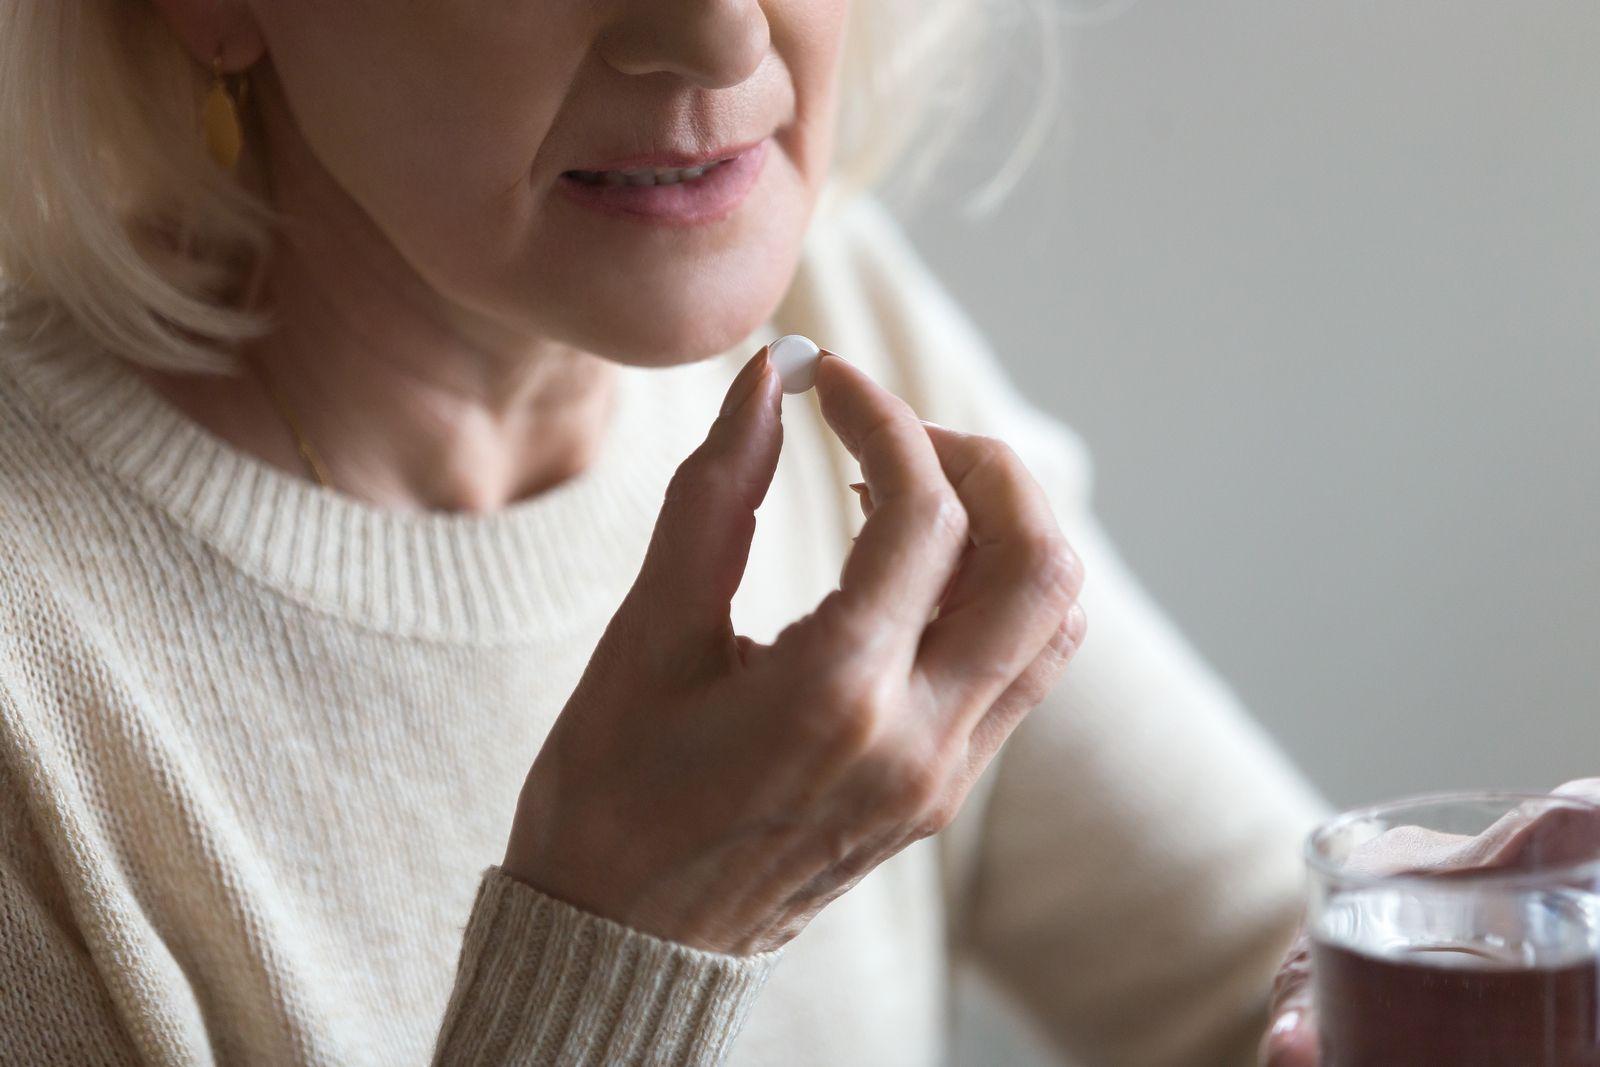 zhenschina-pjet-tabletku